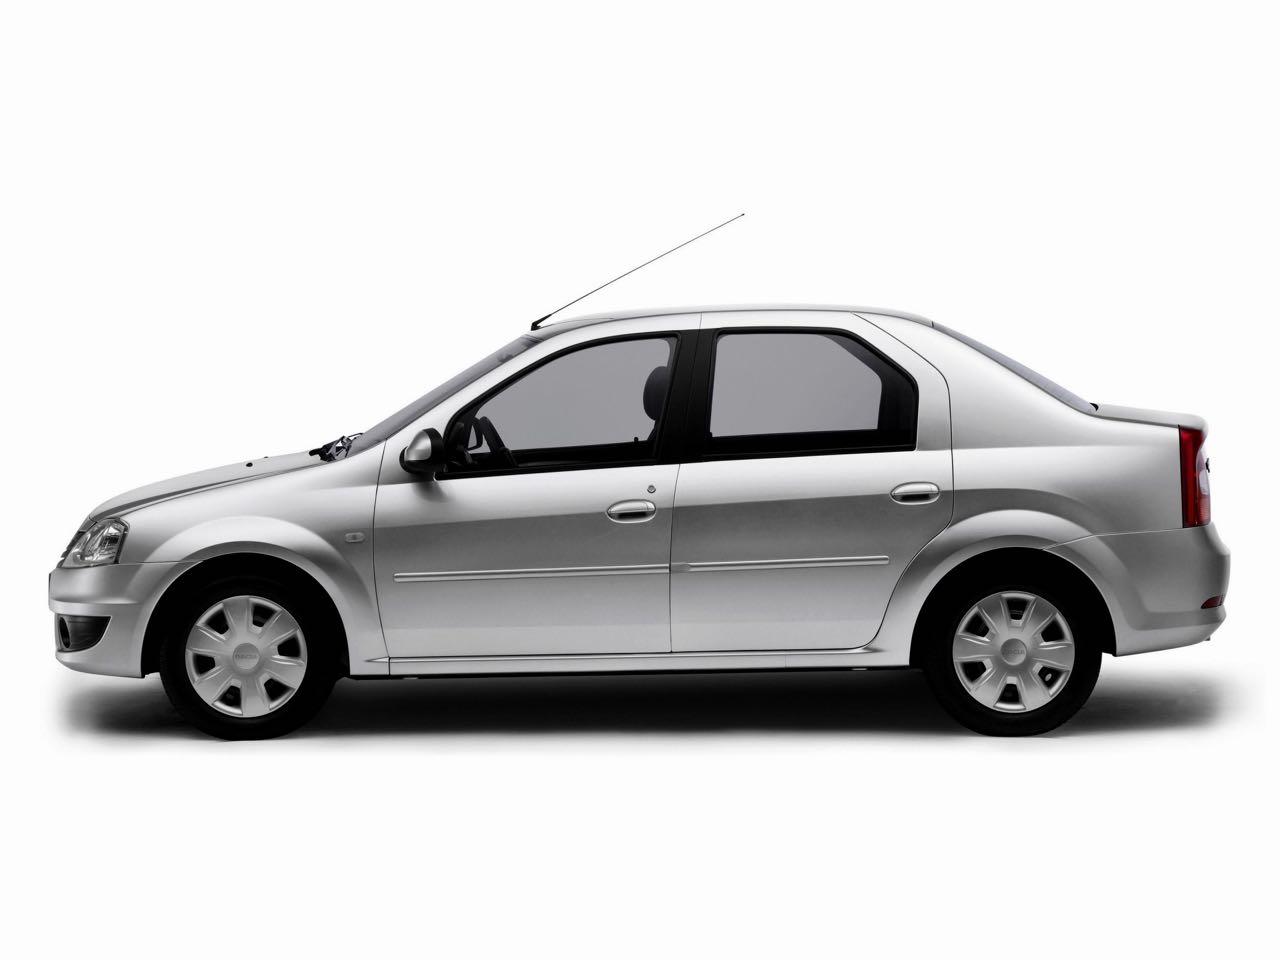 Dacia Logan 2009 lateral